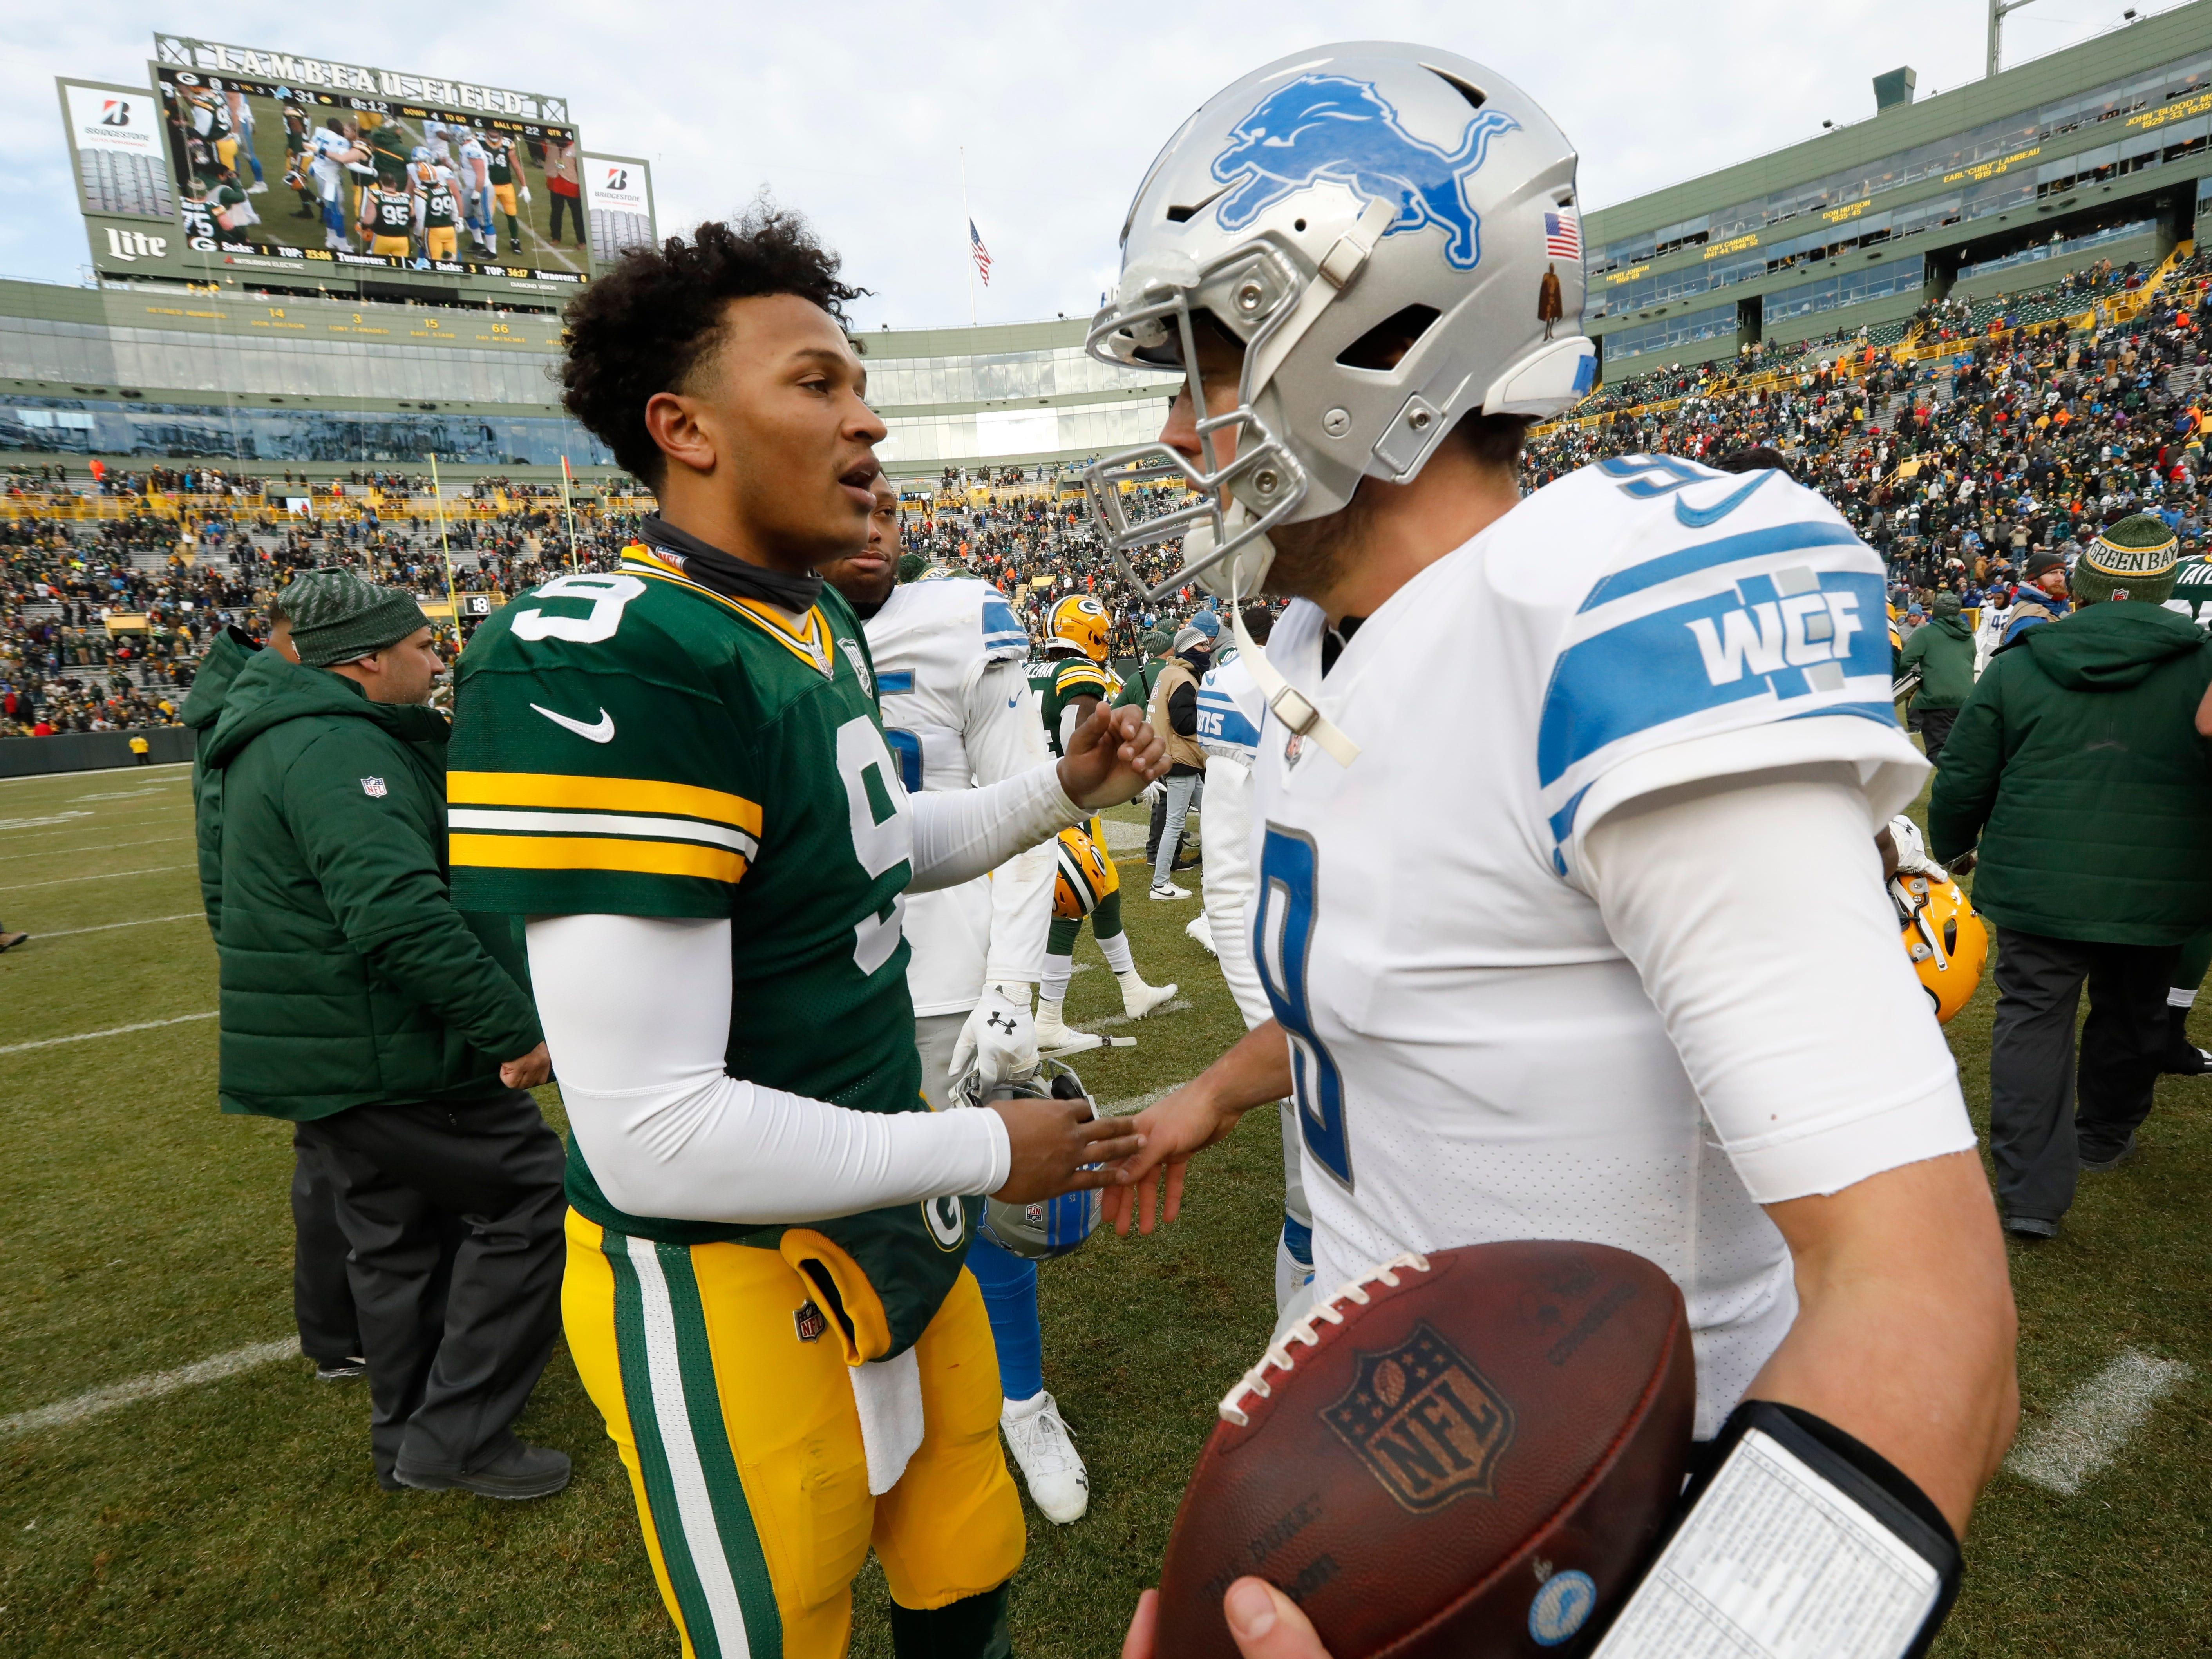 Packers quarterback DeShone Kizer talks to Lions quarterback Matthew Stafford after the game.